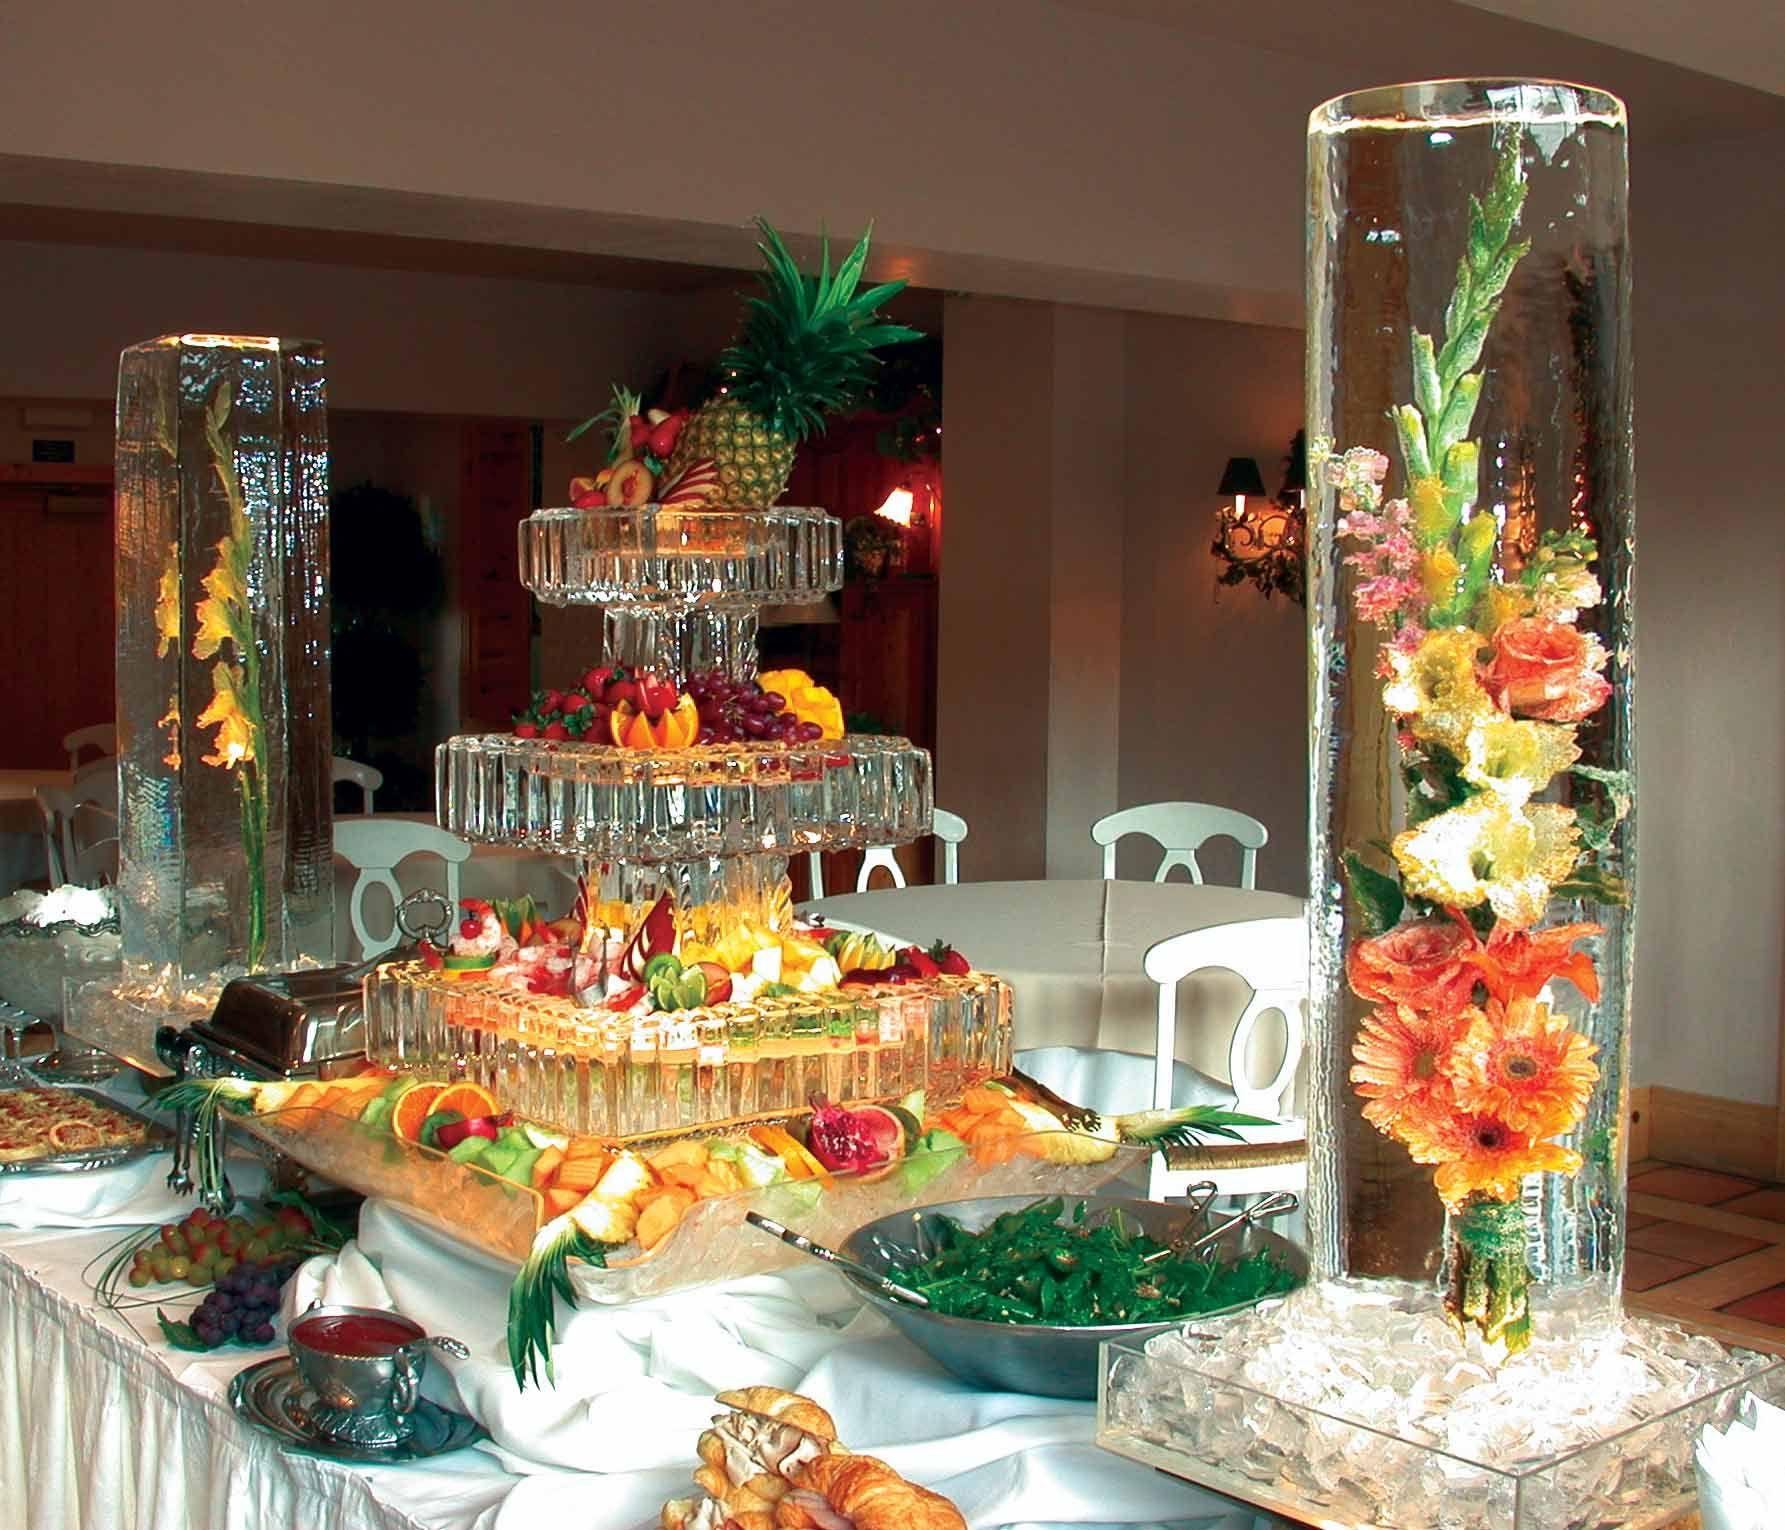 top ten amazing wedding decorations - Google Search ... - photo#13